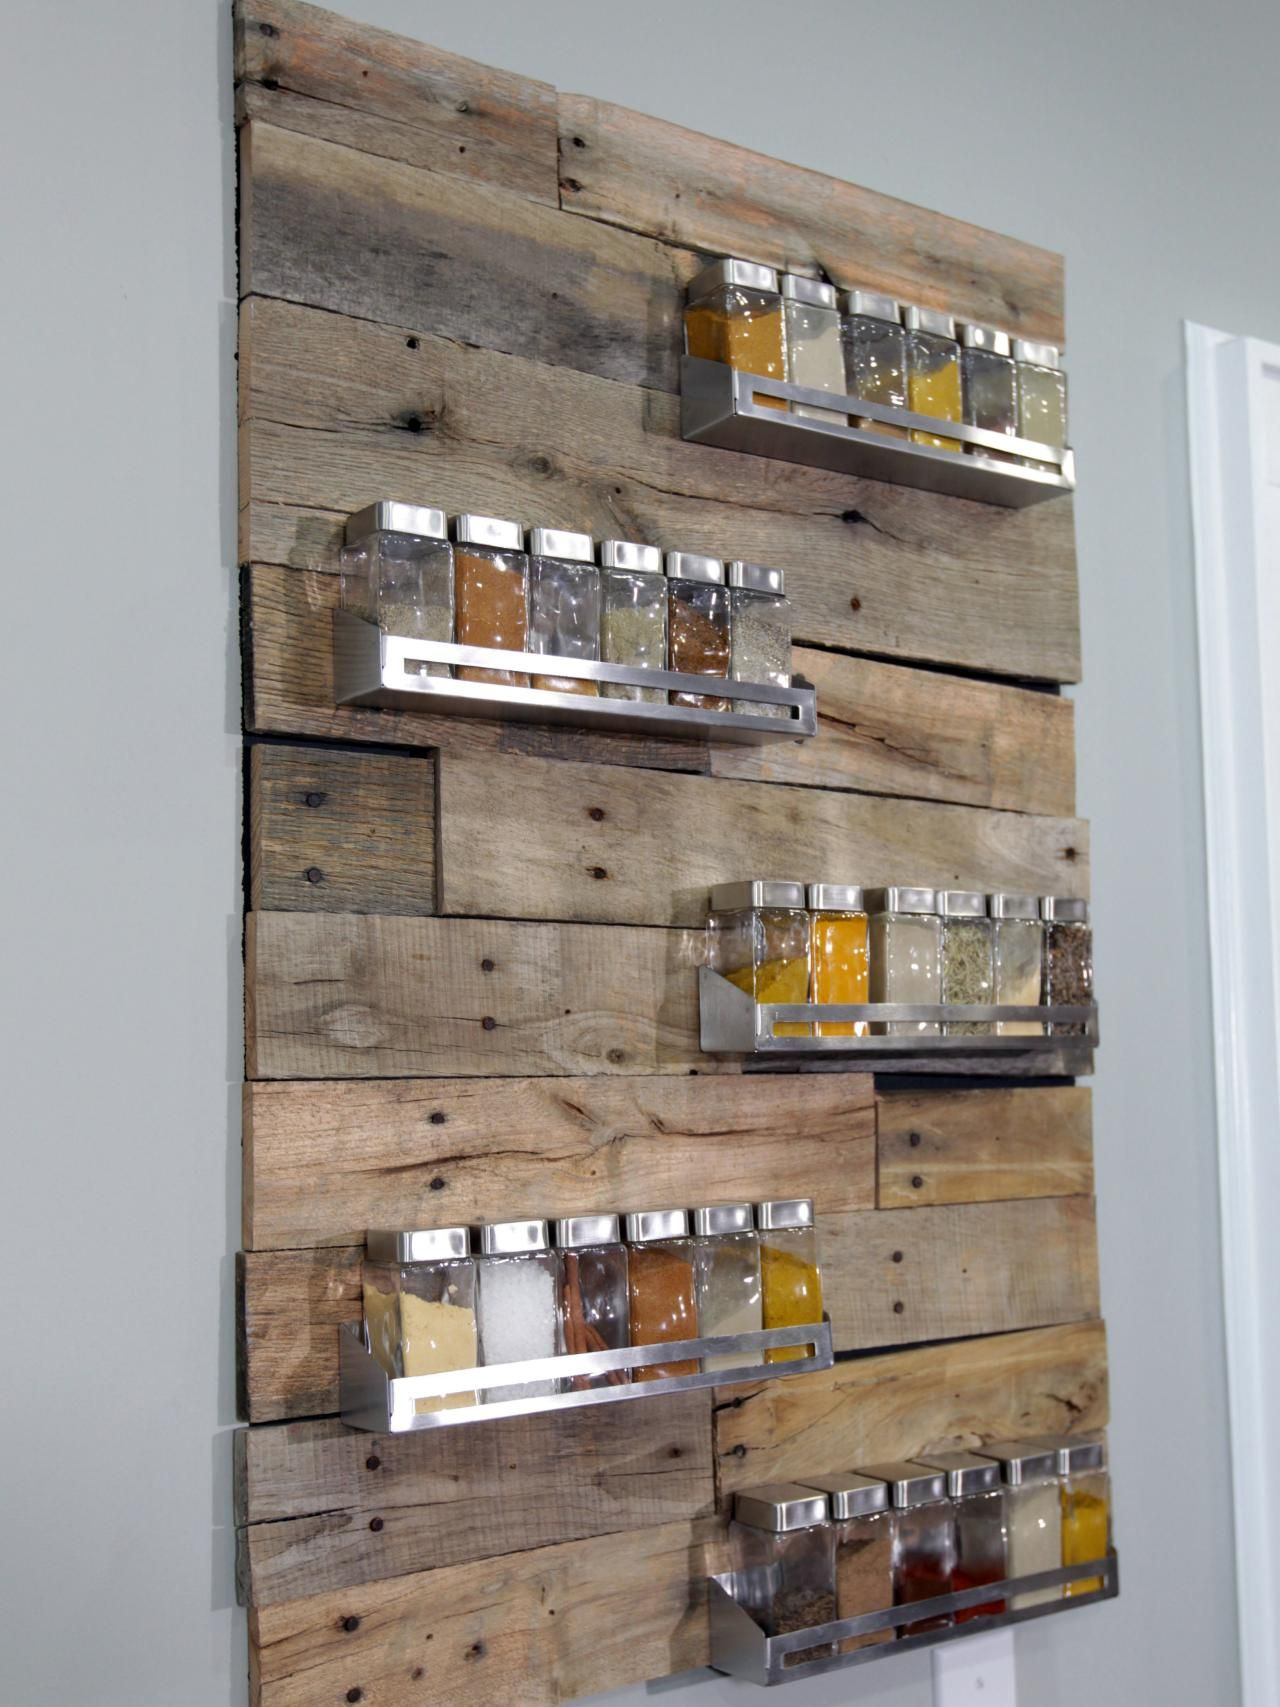 29 Clever Ways to Keep Your Kitchen Organized | Kitchen spice ...